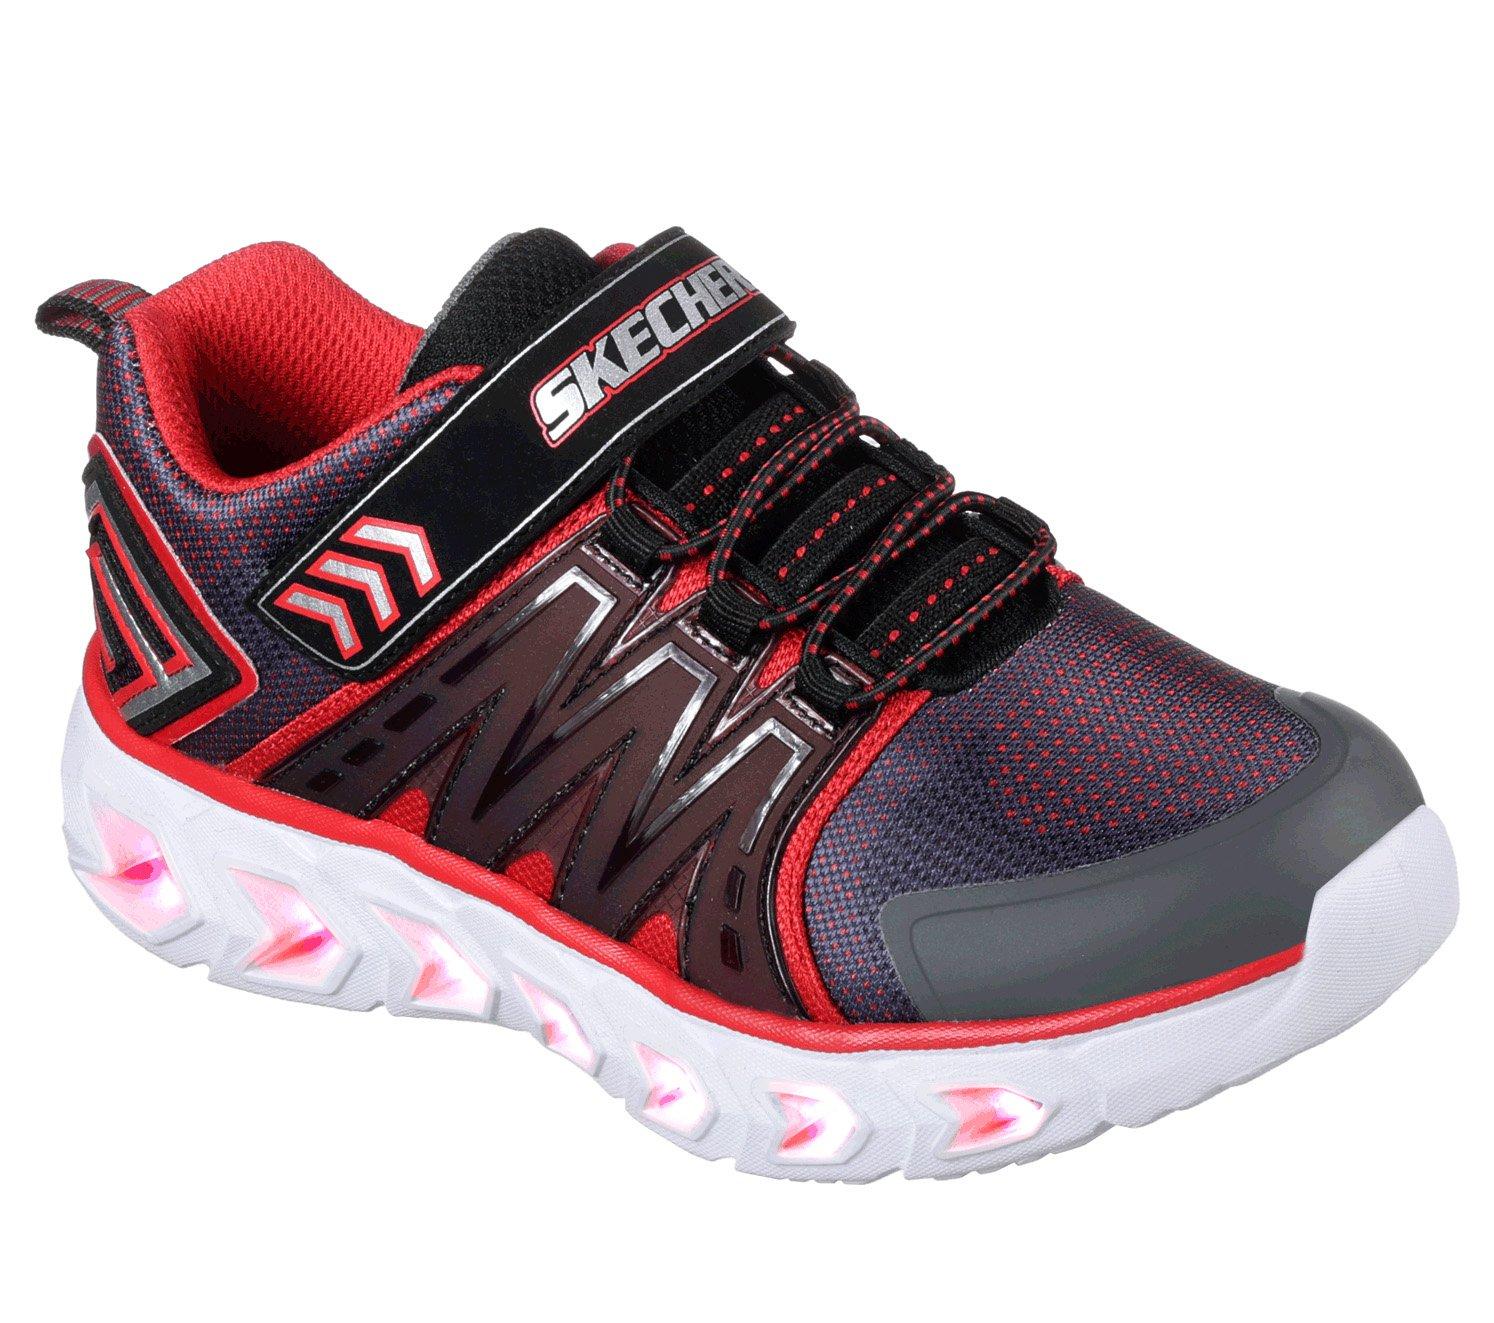 Skechers Kids Kids' Hypno-Flash 2.0 Sneaker,Charcoal/red,2.5 Medium US Little Kid